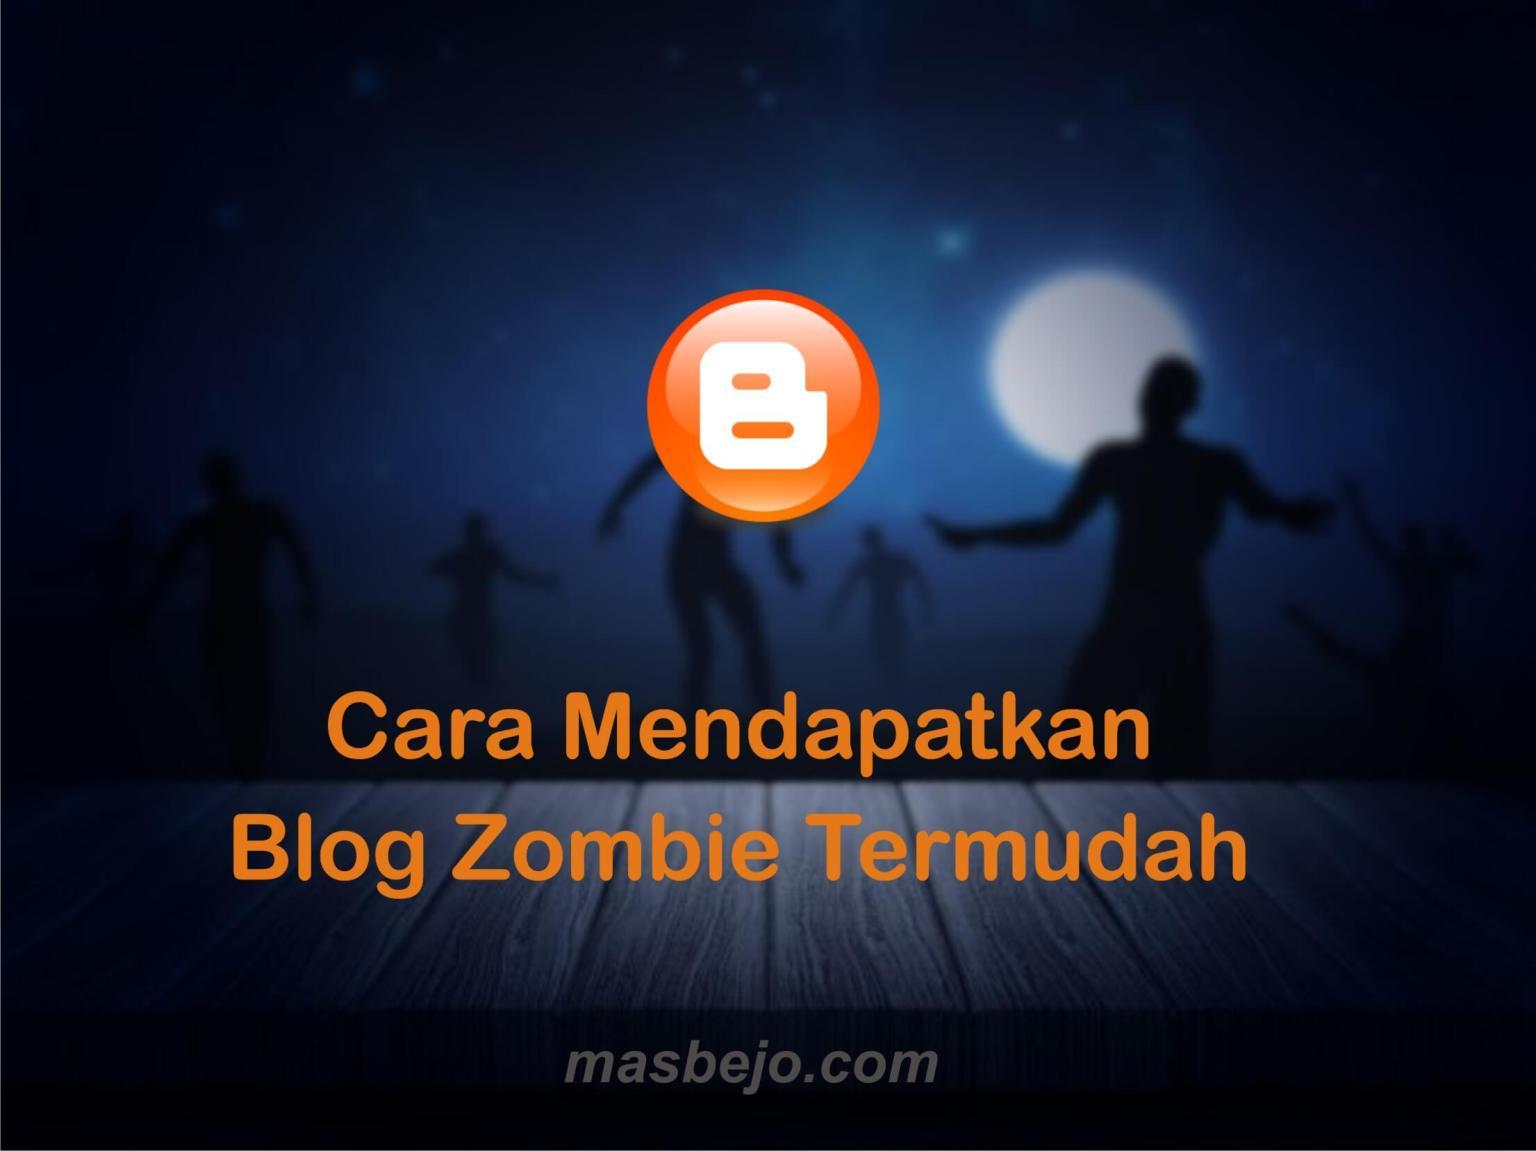 Cara Mendapatkan Blog Zombie Termudah